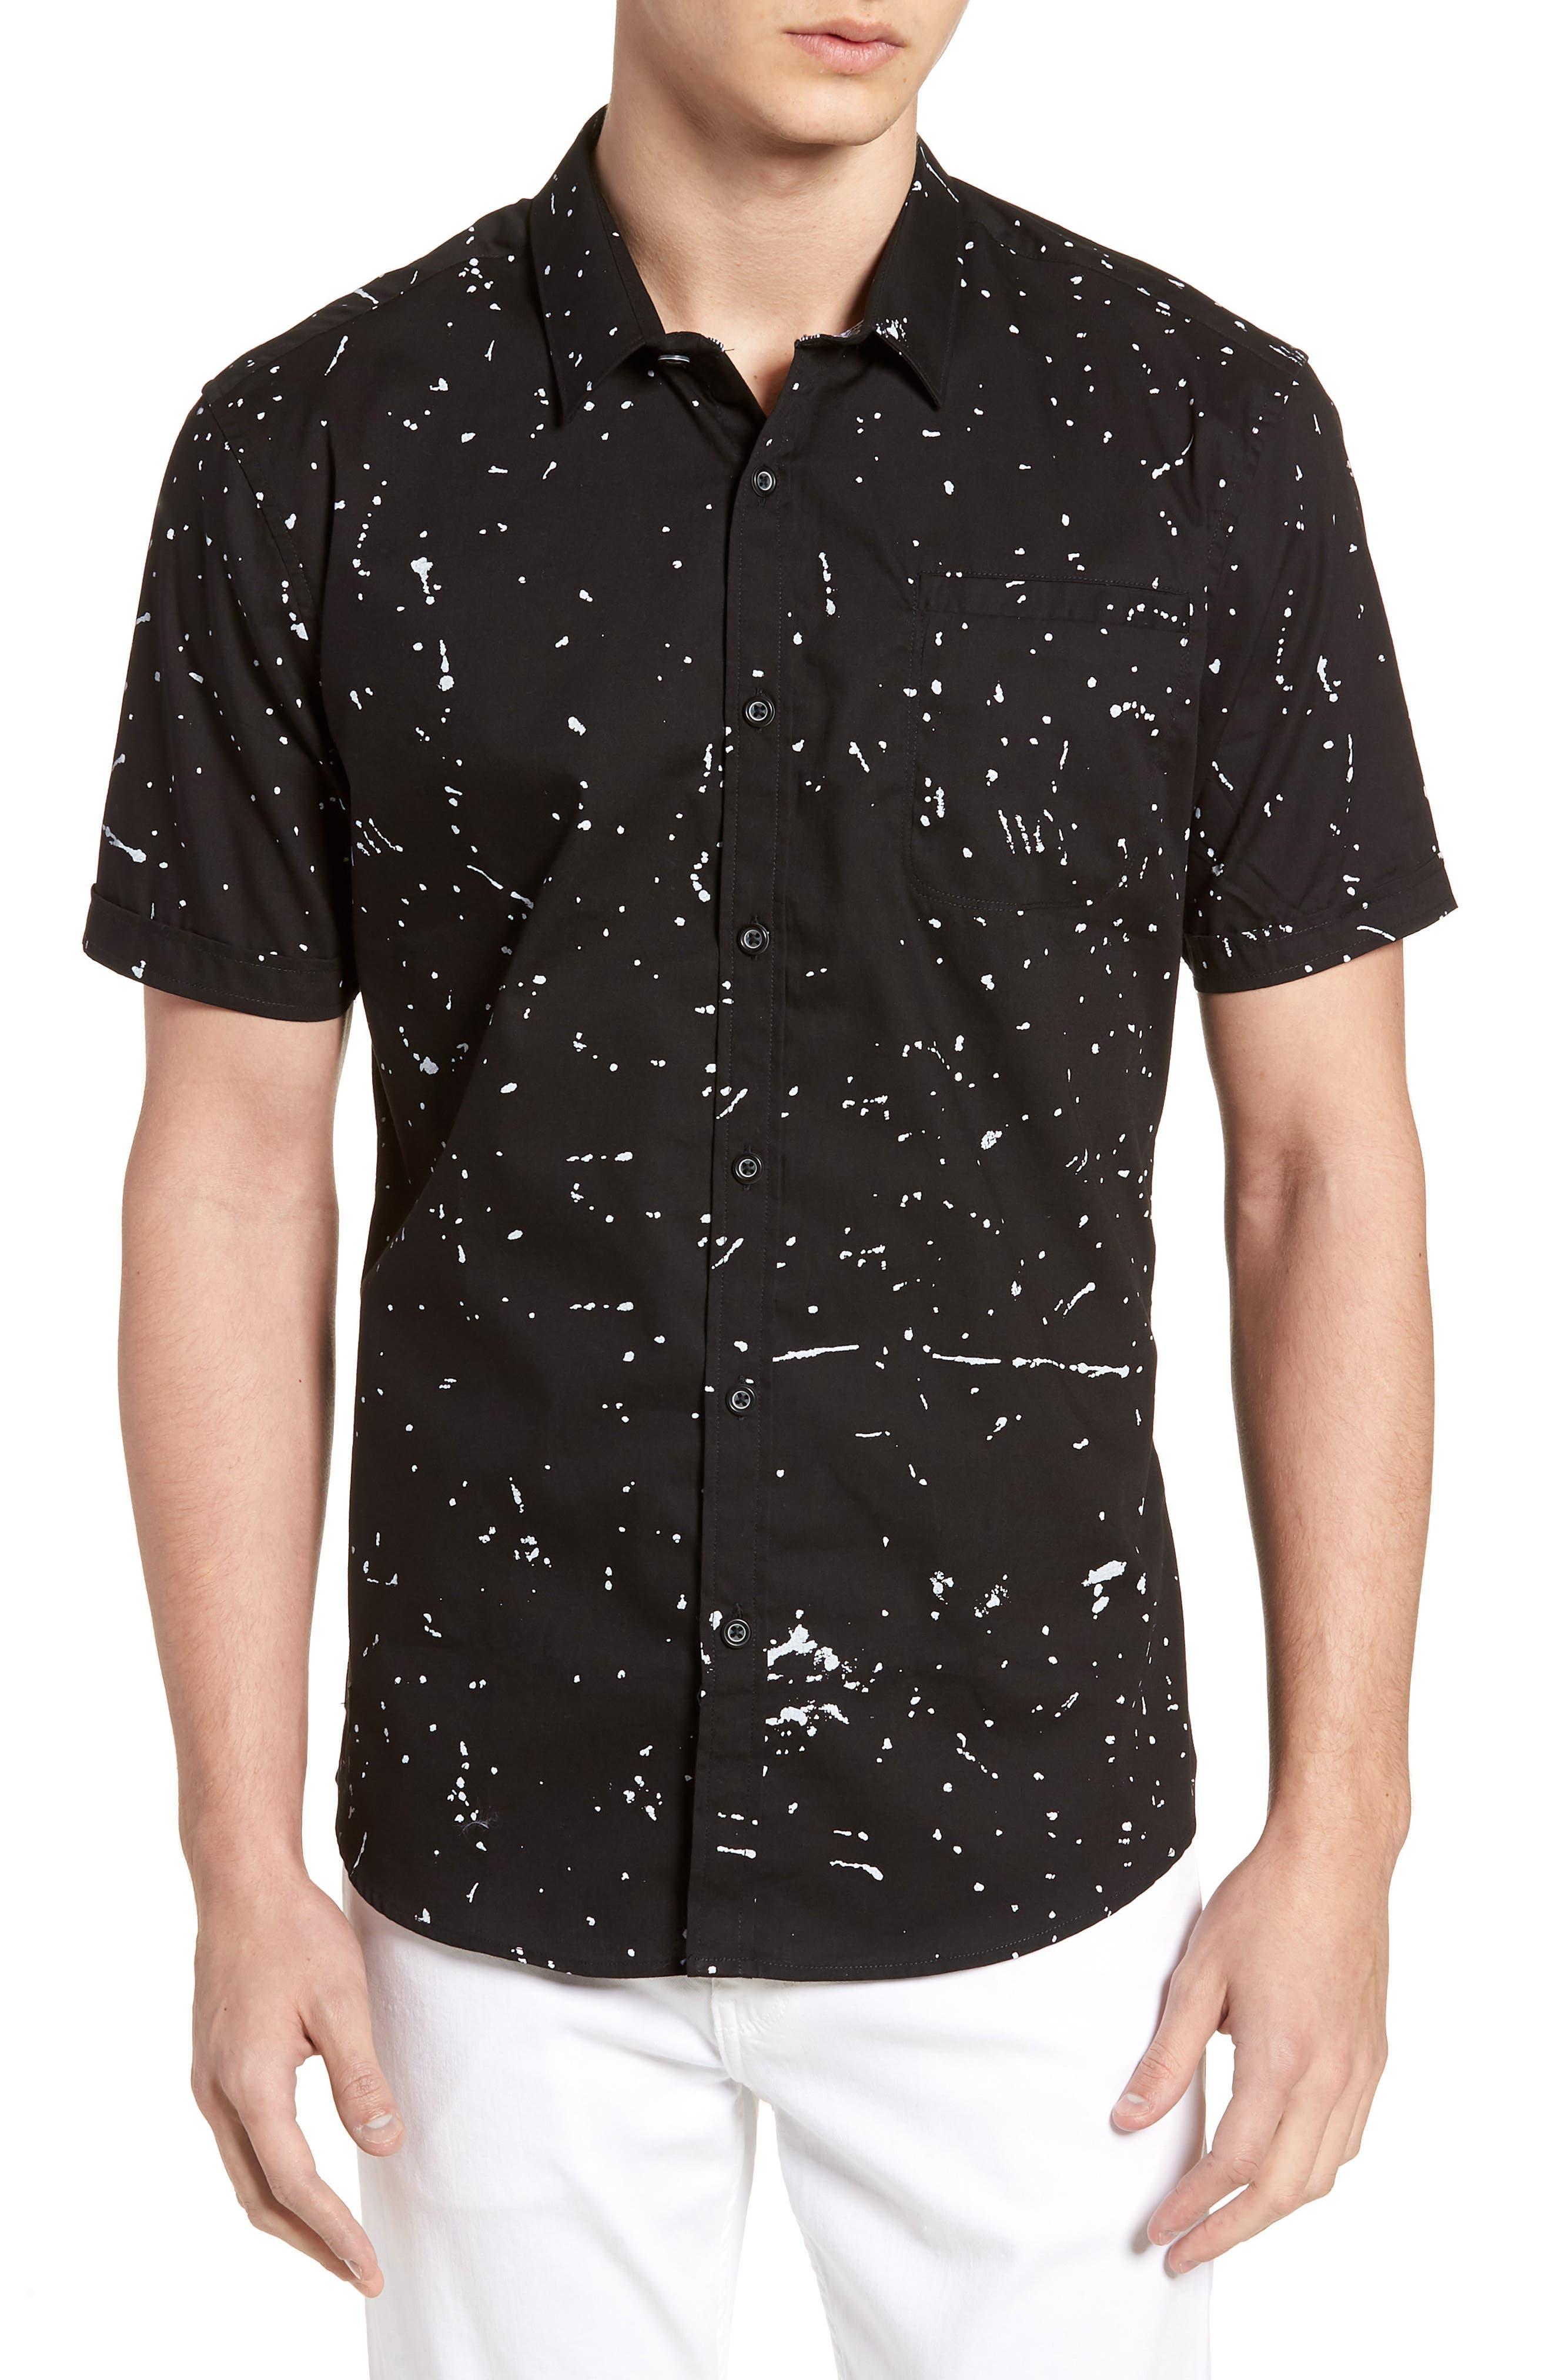 Sky Walker Splatter Sport Shirt,                             Main thumbnail 1, color,                             001